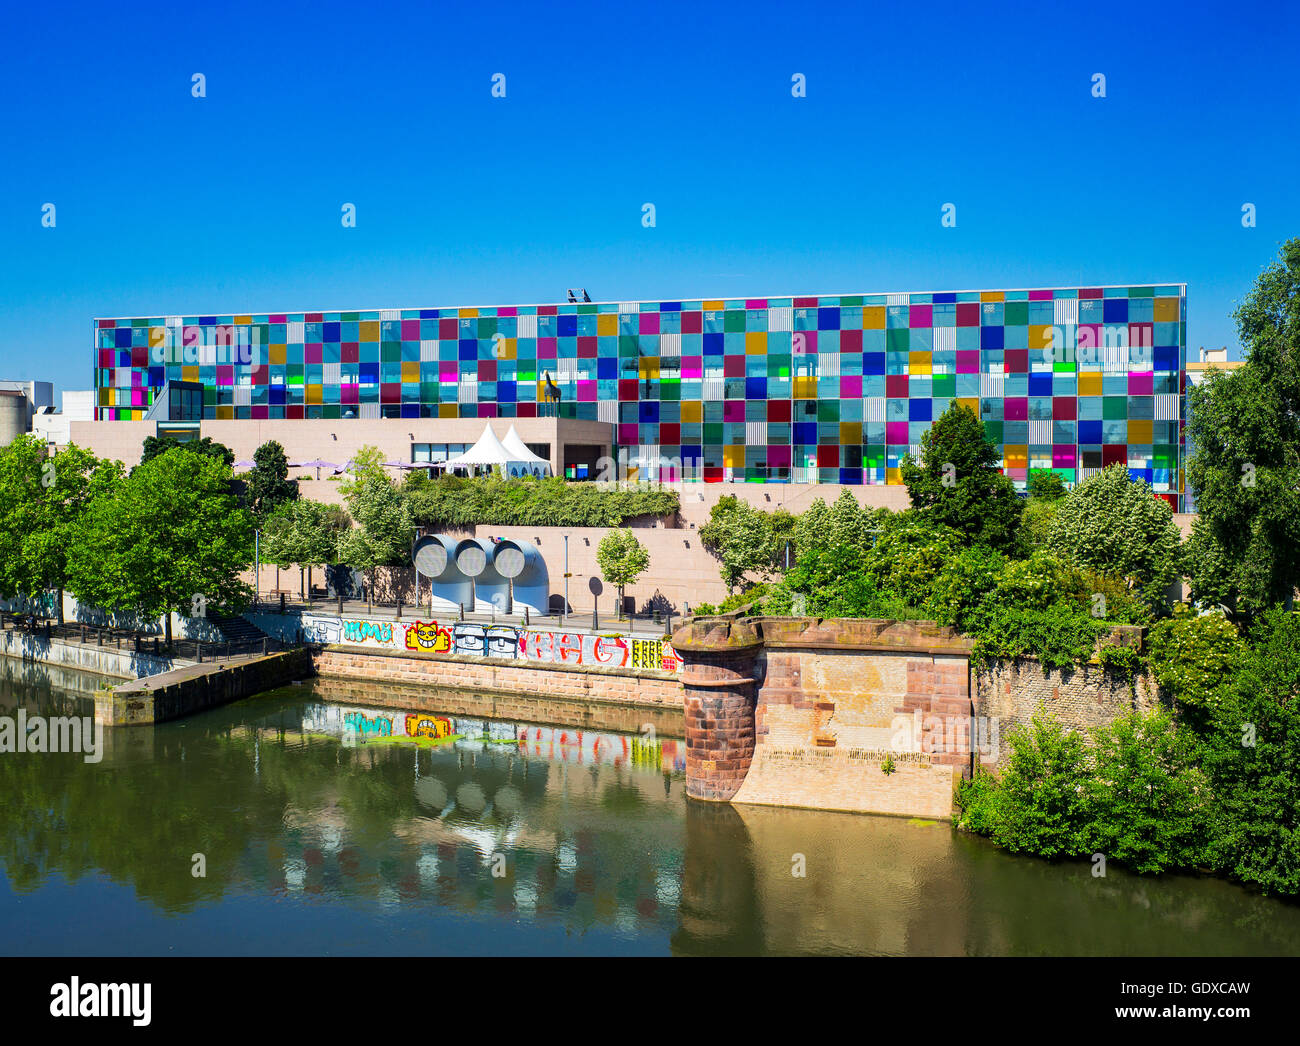 Museum of Modern and Contemporary Art, Strasbourg, Alsace, France, MAMCS, Musée d'Art Moderne et Contemporain - Stock Image